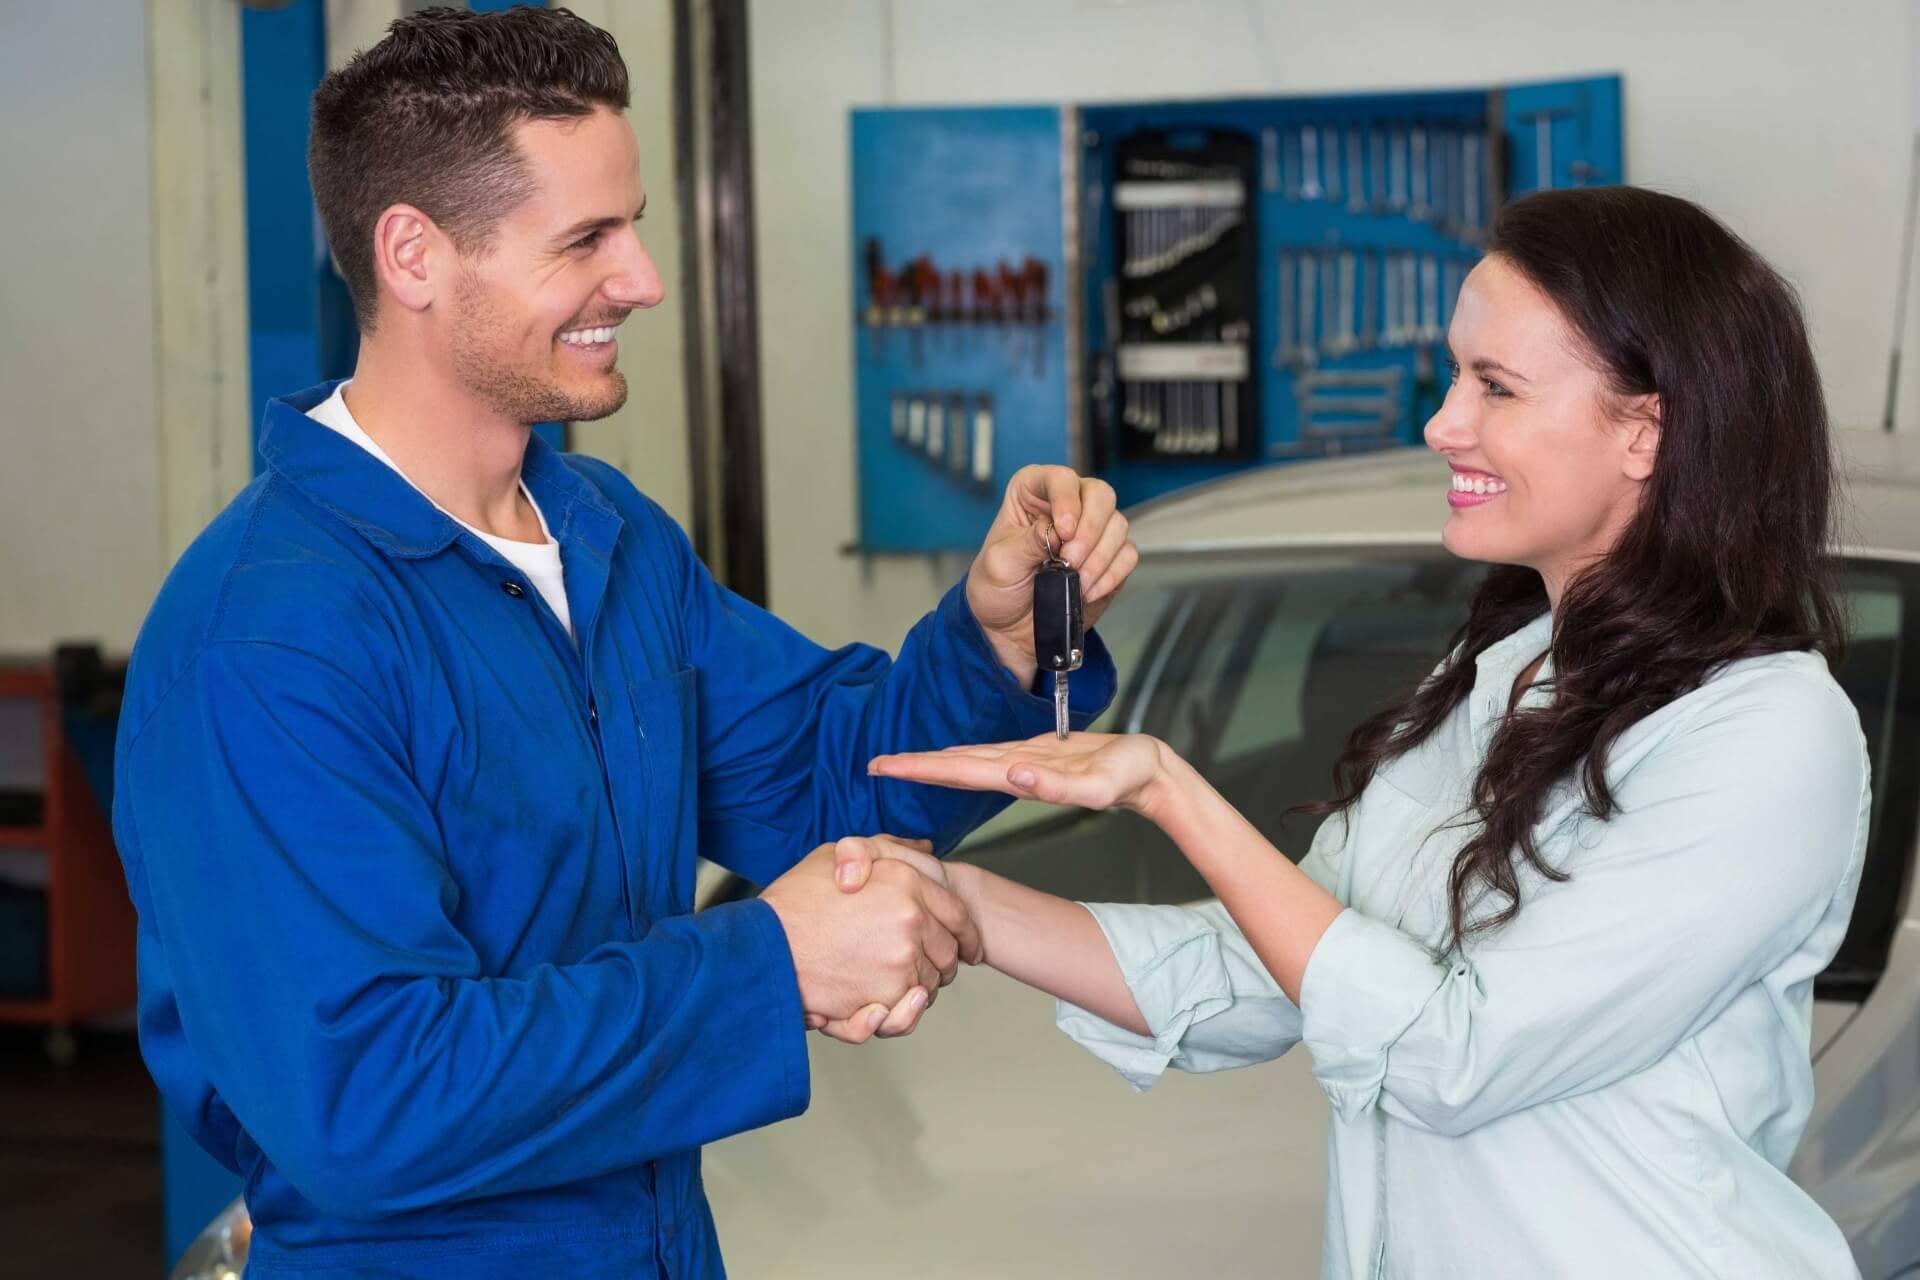 Overdelivering para chaveiros otimizando serviço e encantando o cliente